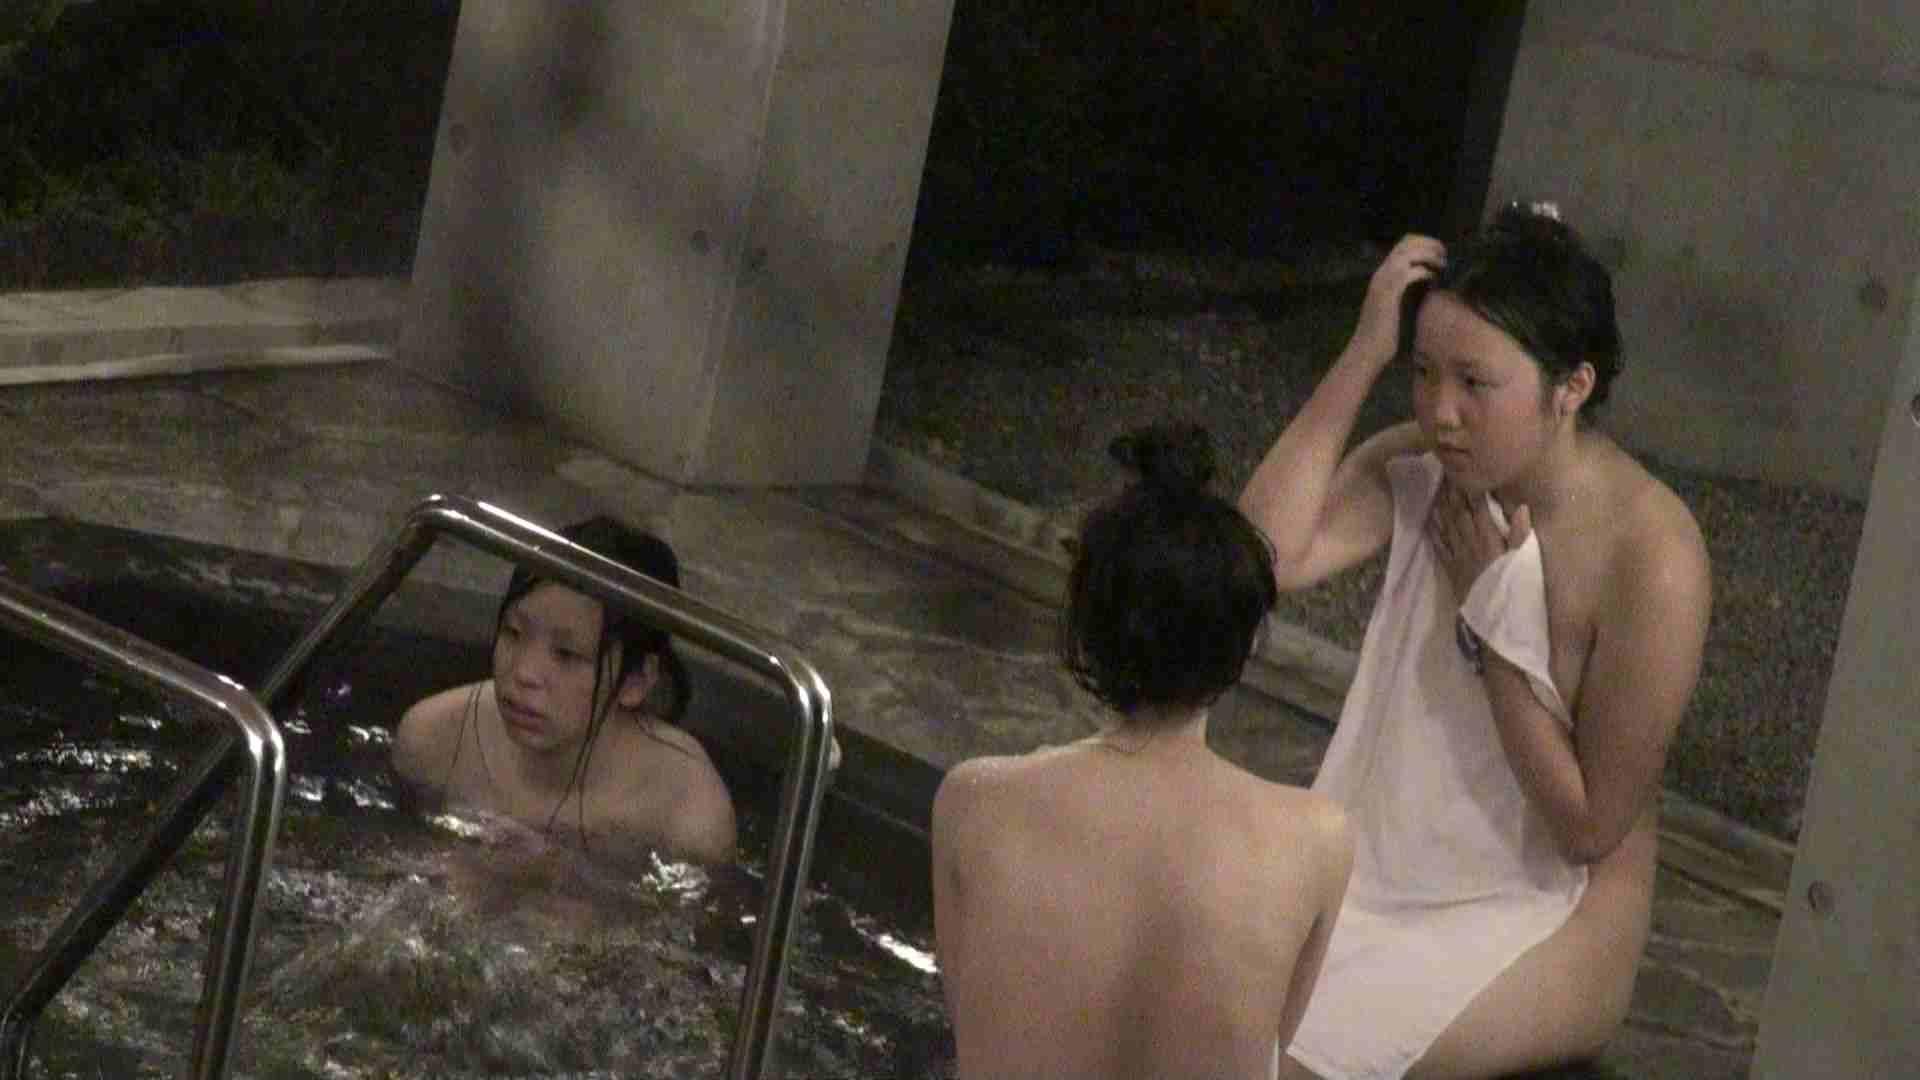 Aquaな露天風呂Vol.383 露天 オマンコ無修正動画無料 79連発 19